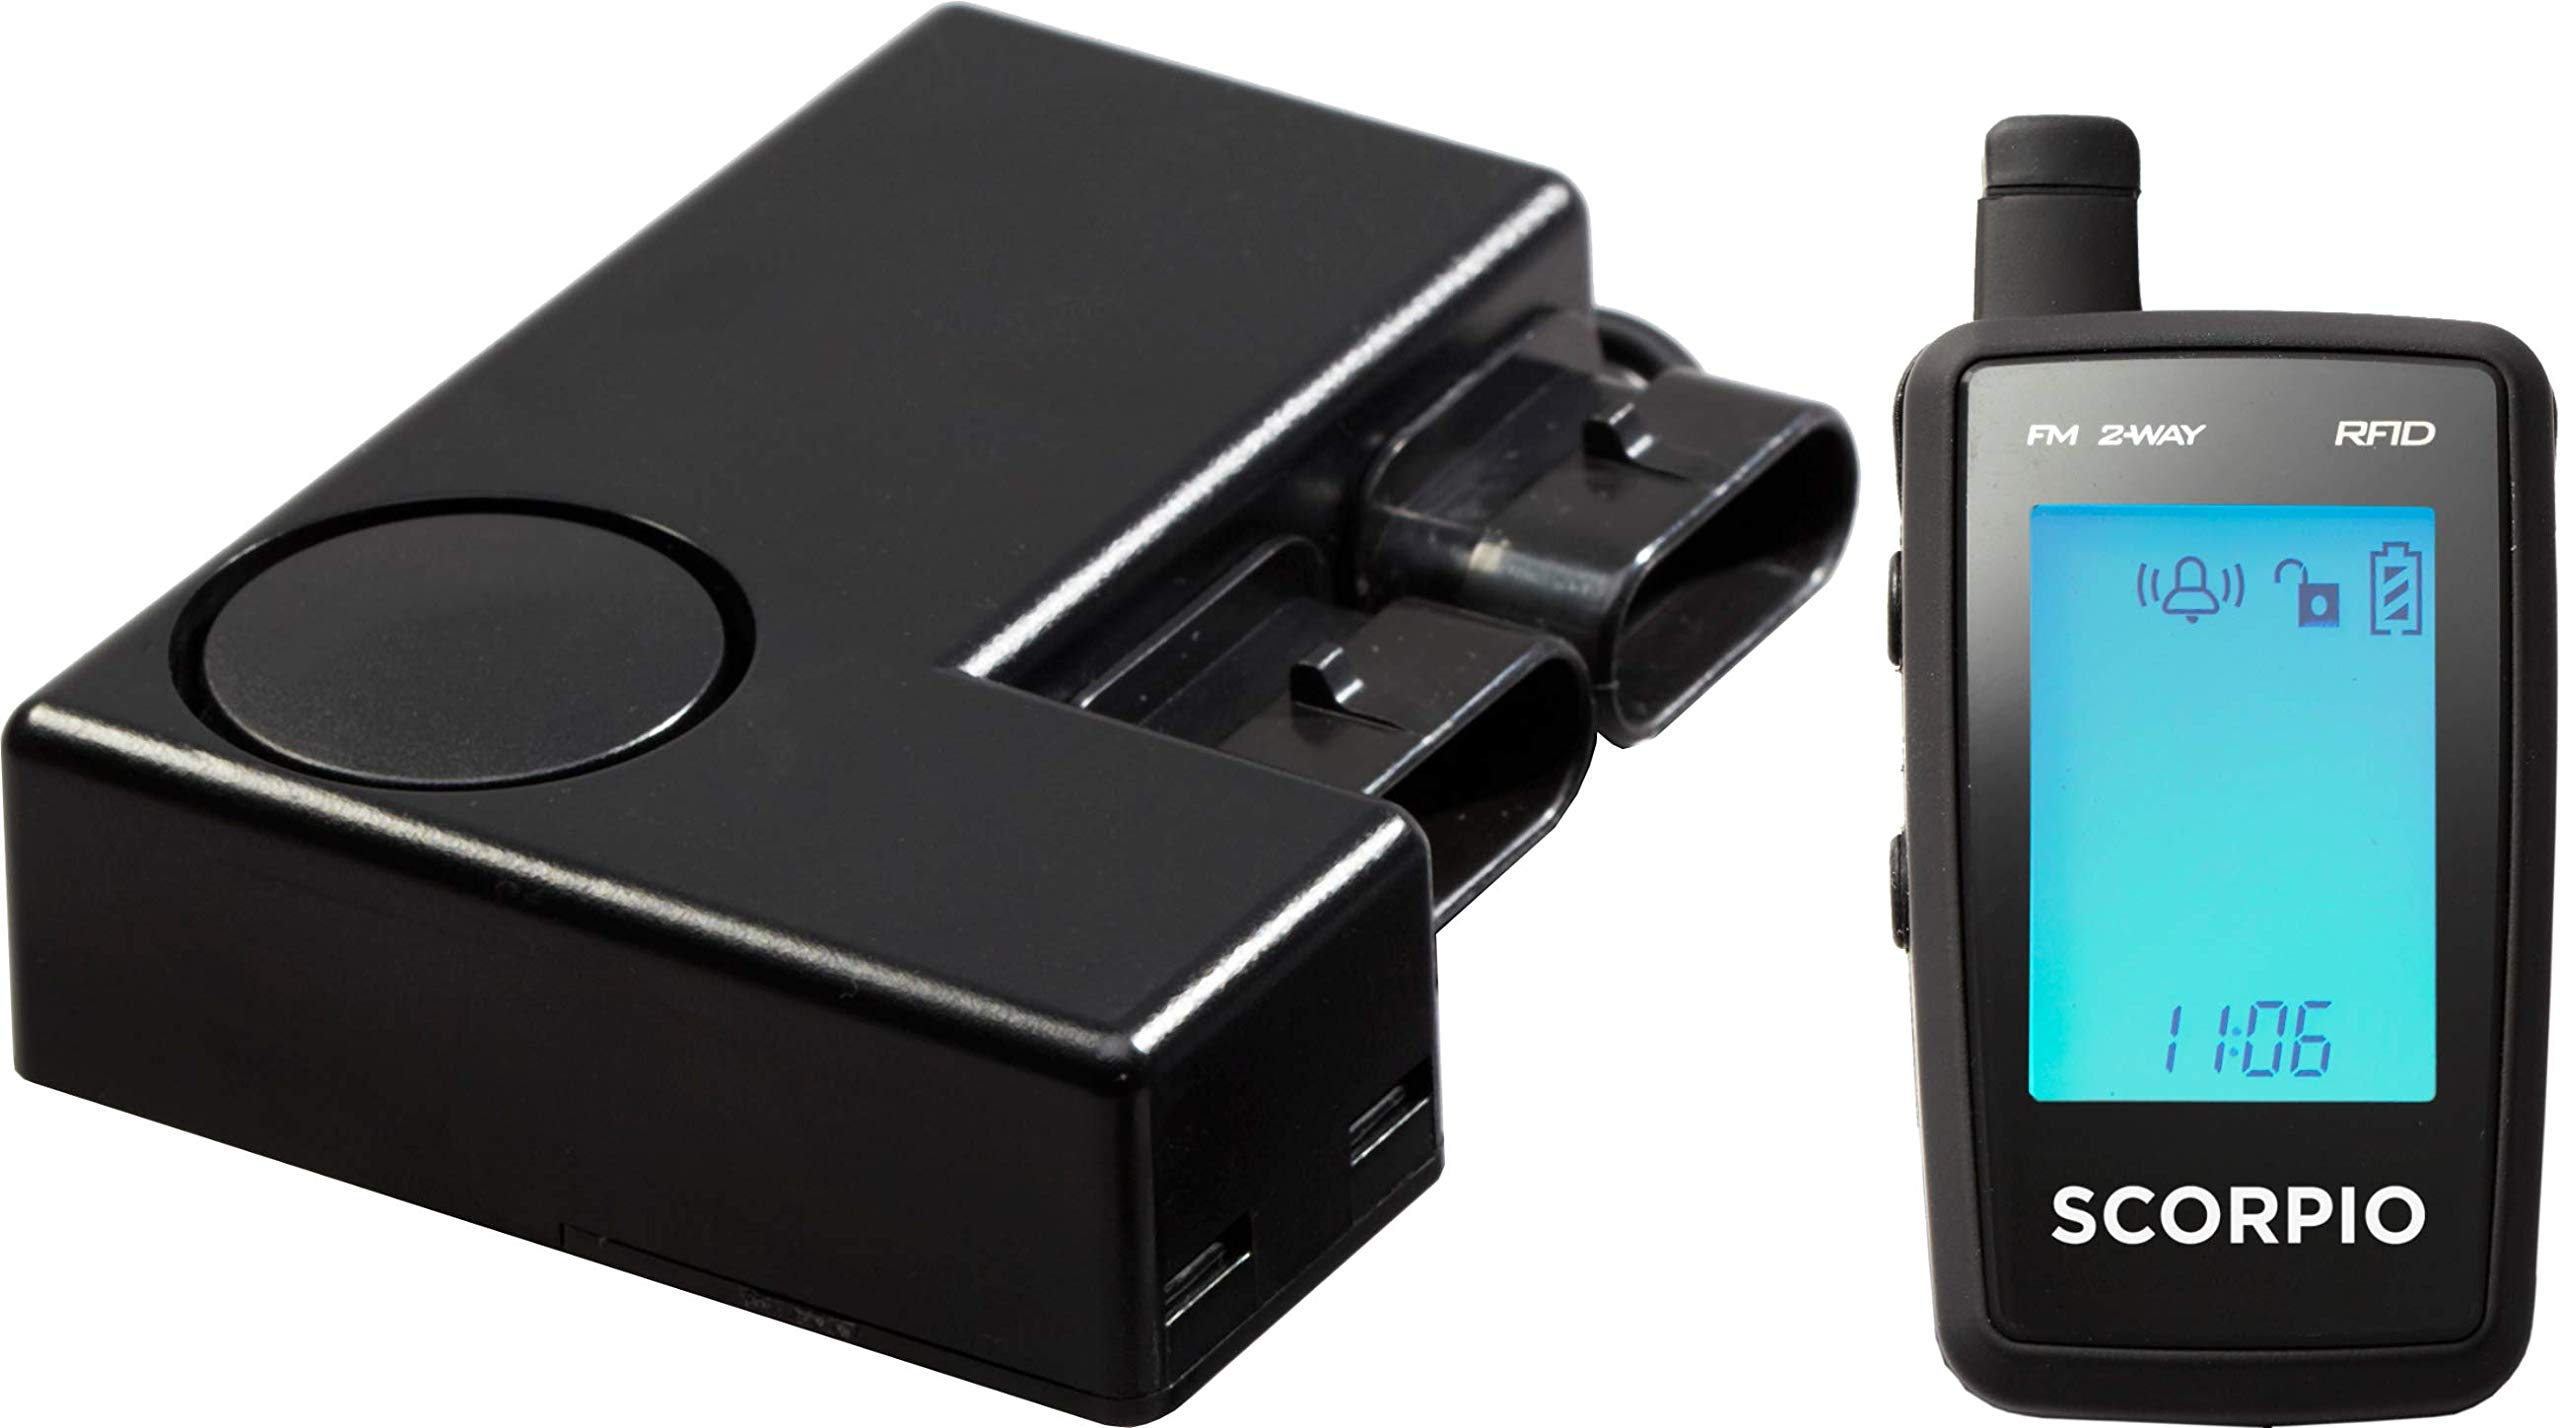 Scorpio Motorcycle Alarm – SRX-900 – Hands-Free Motorcycle Alarm With 2-Way Alerts